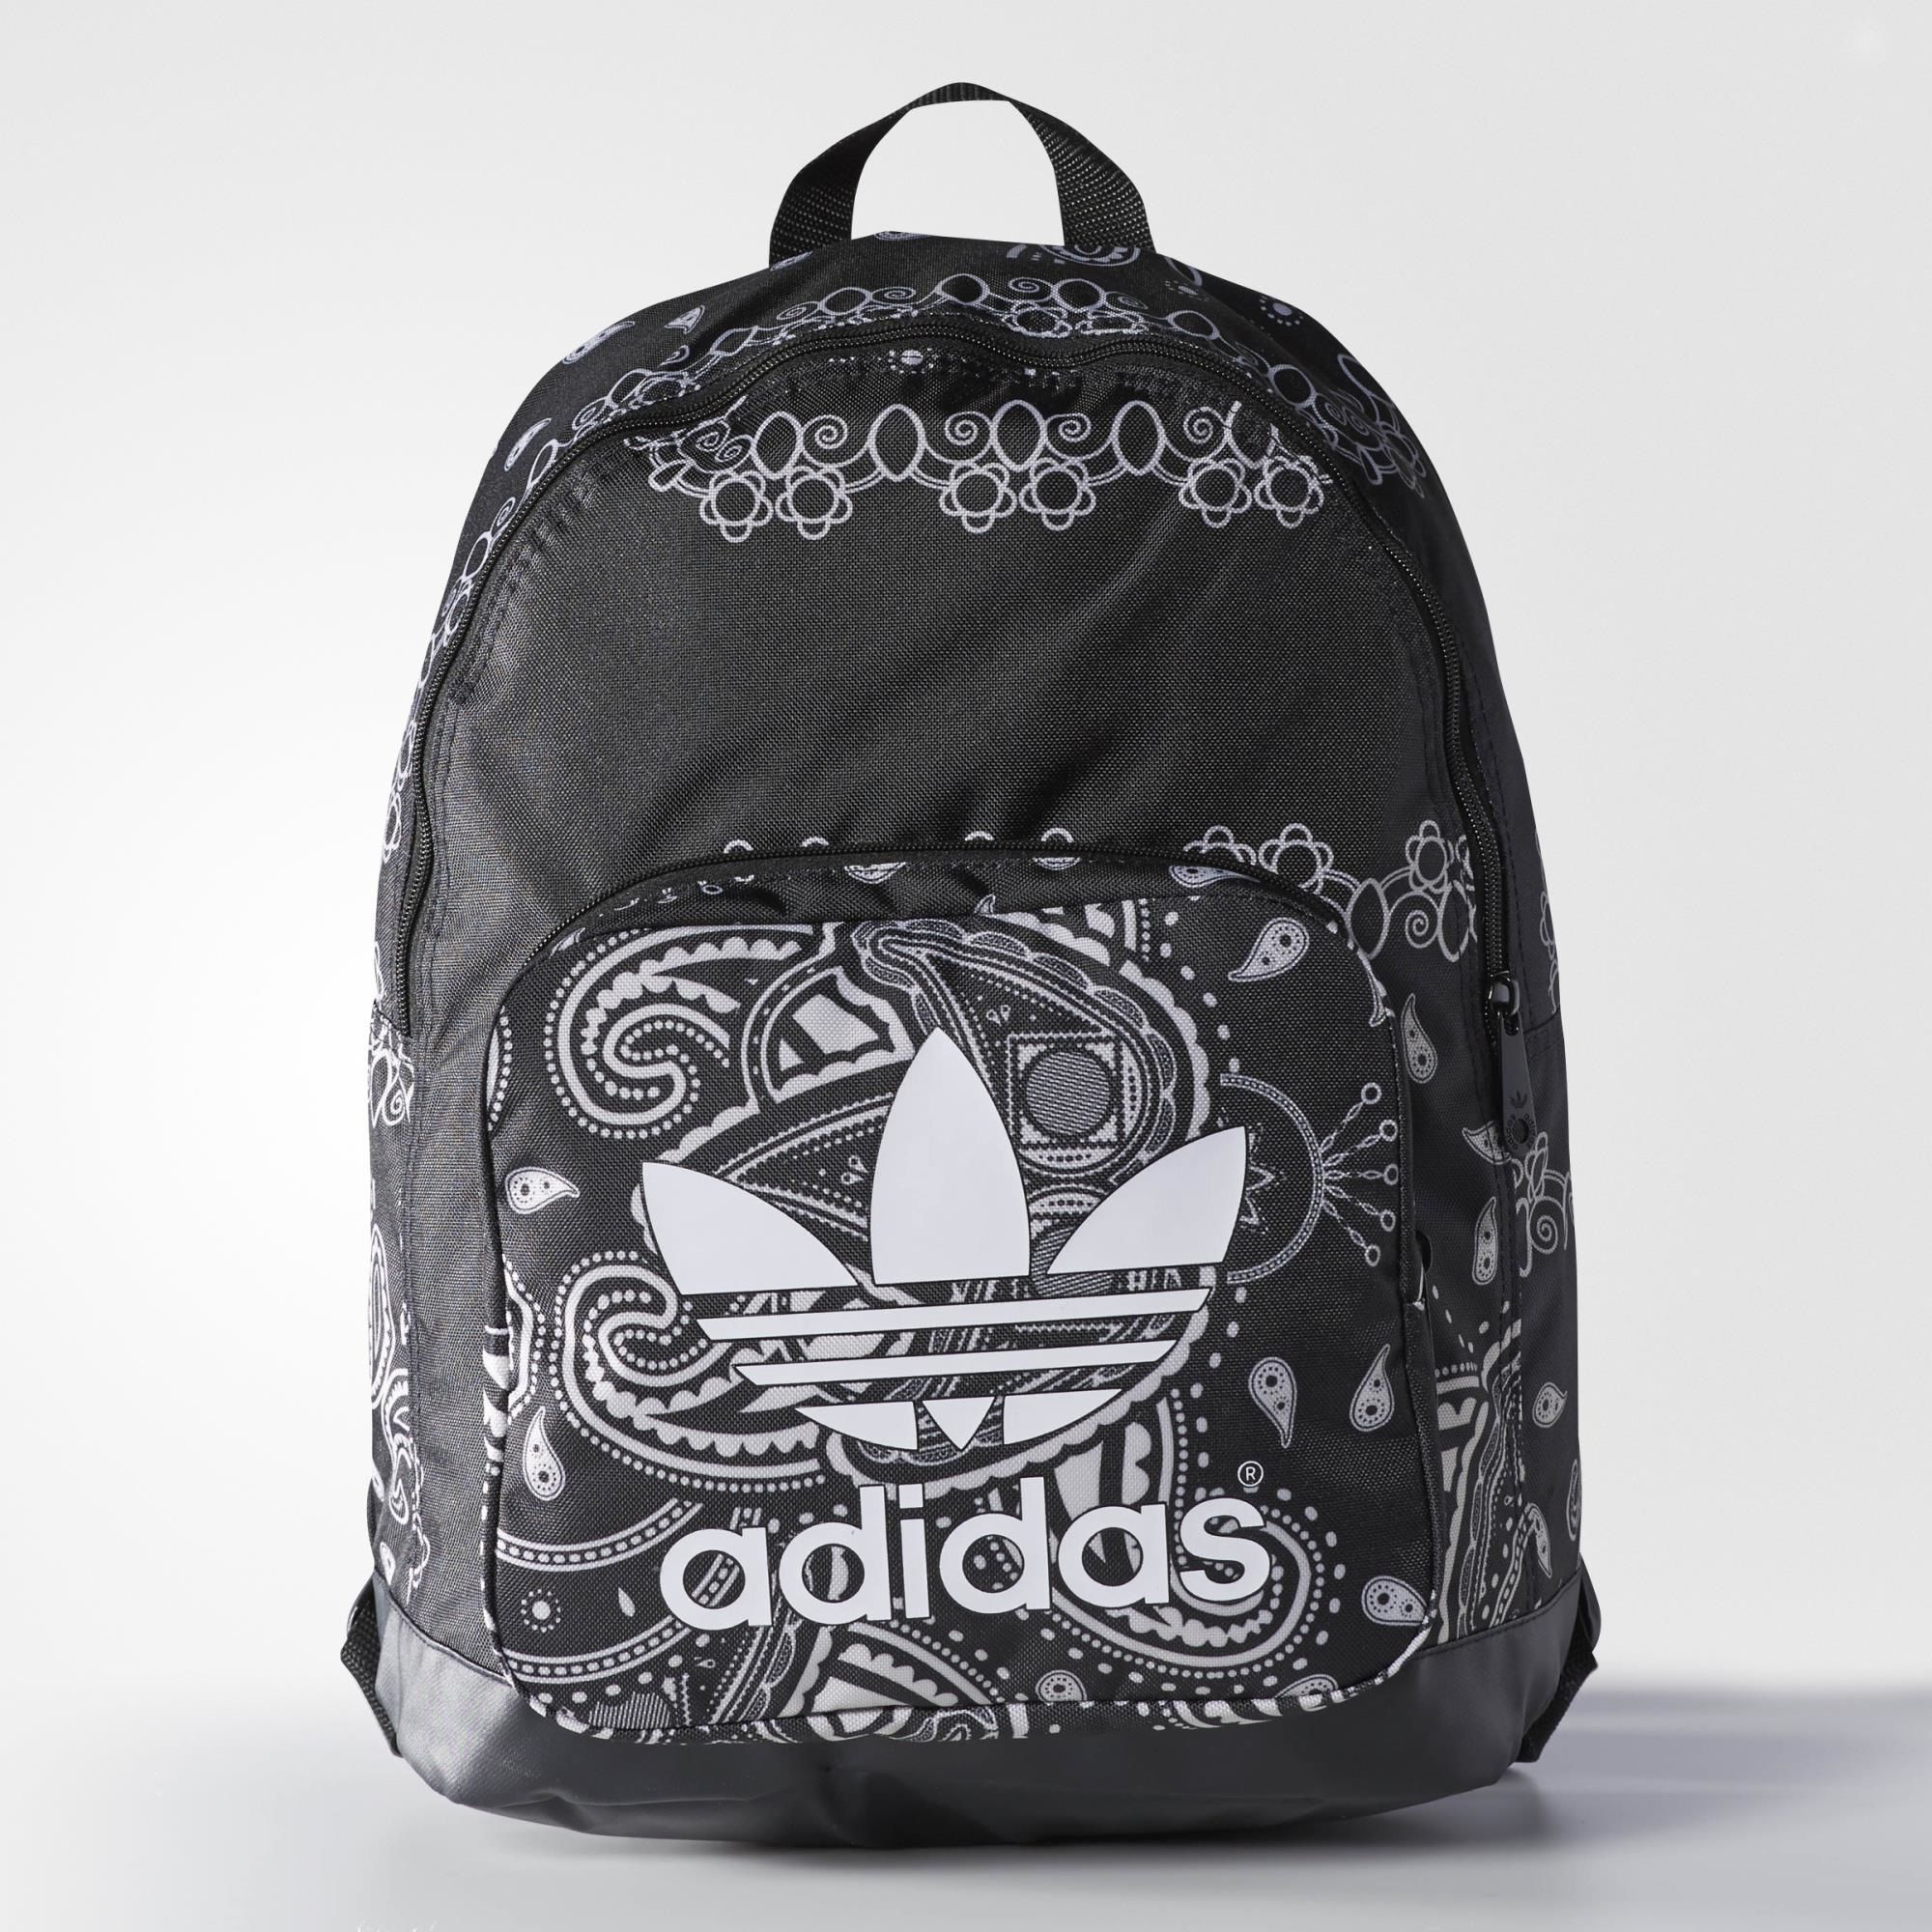 8aedfd21a7 adidas - Paisley Backpack | Birthday wishlist | Adidas backpack ...